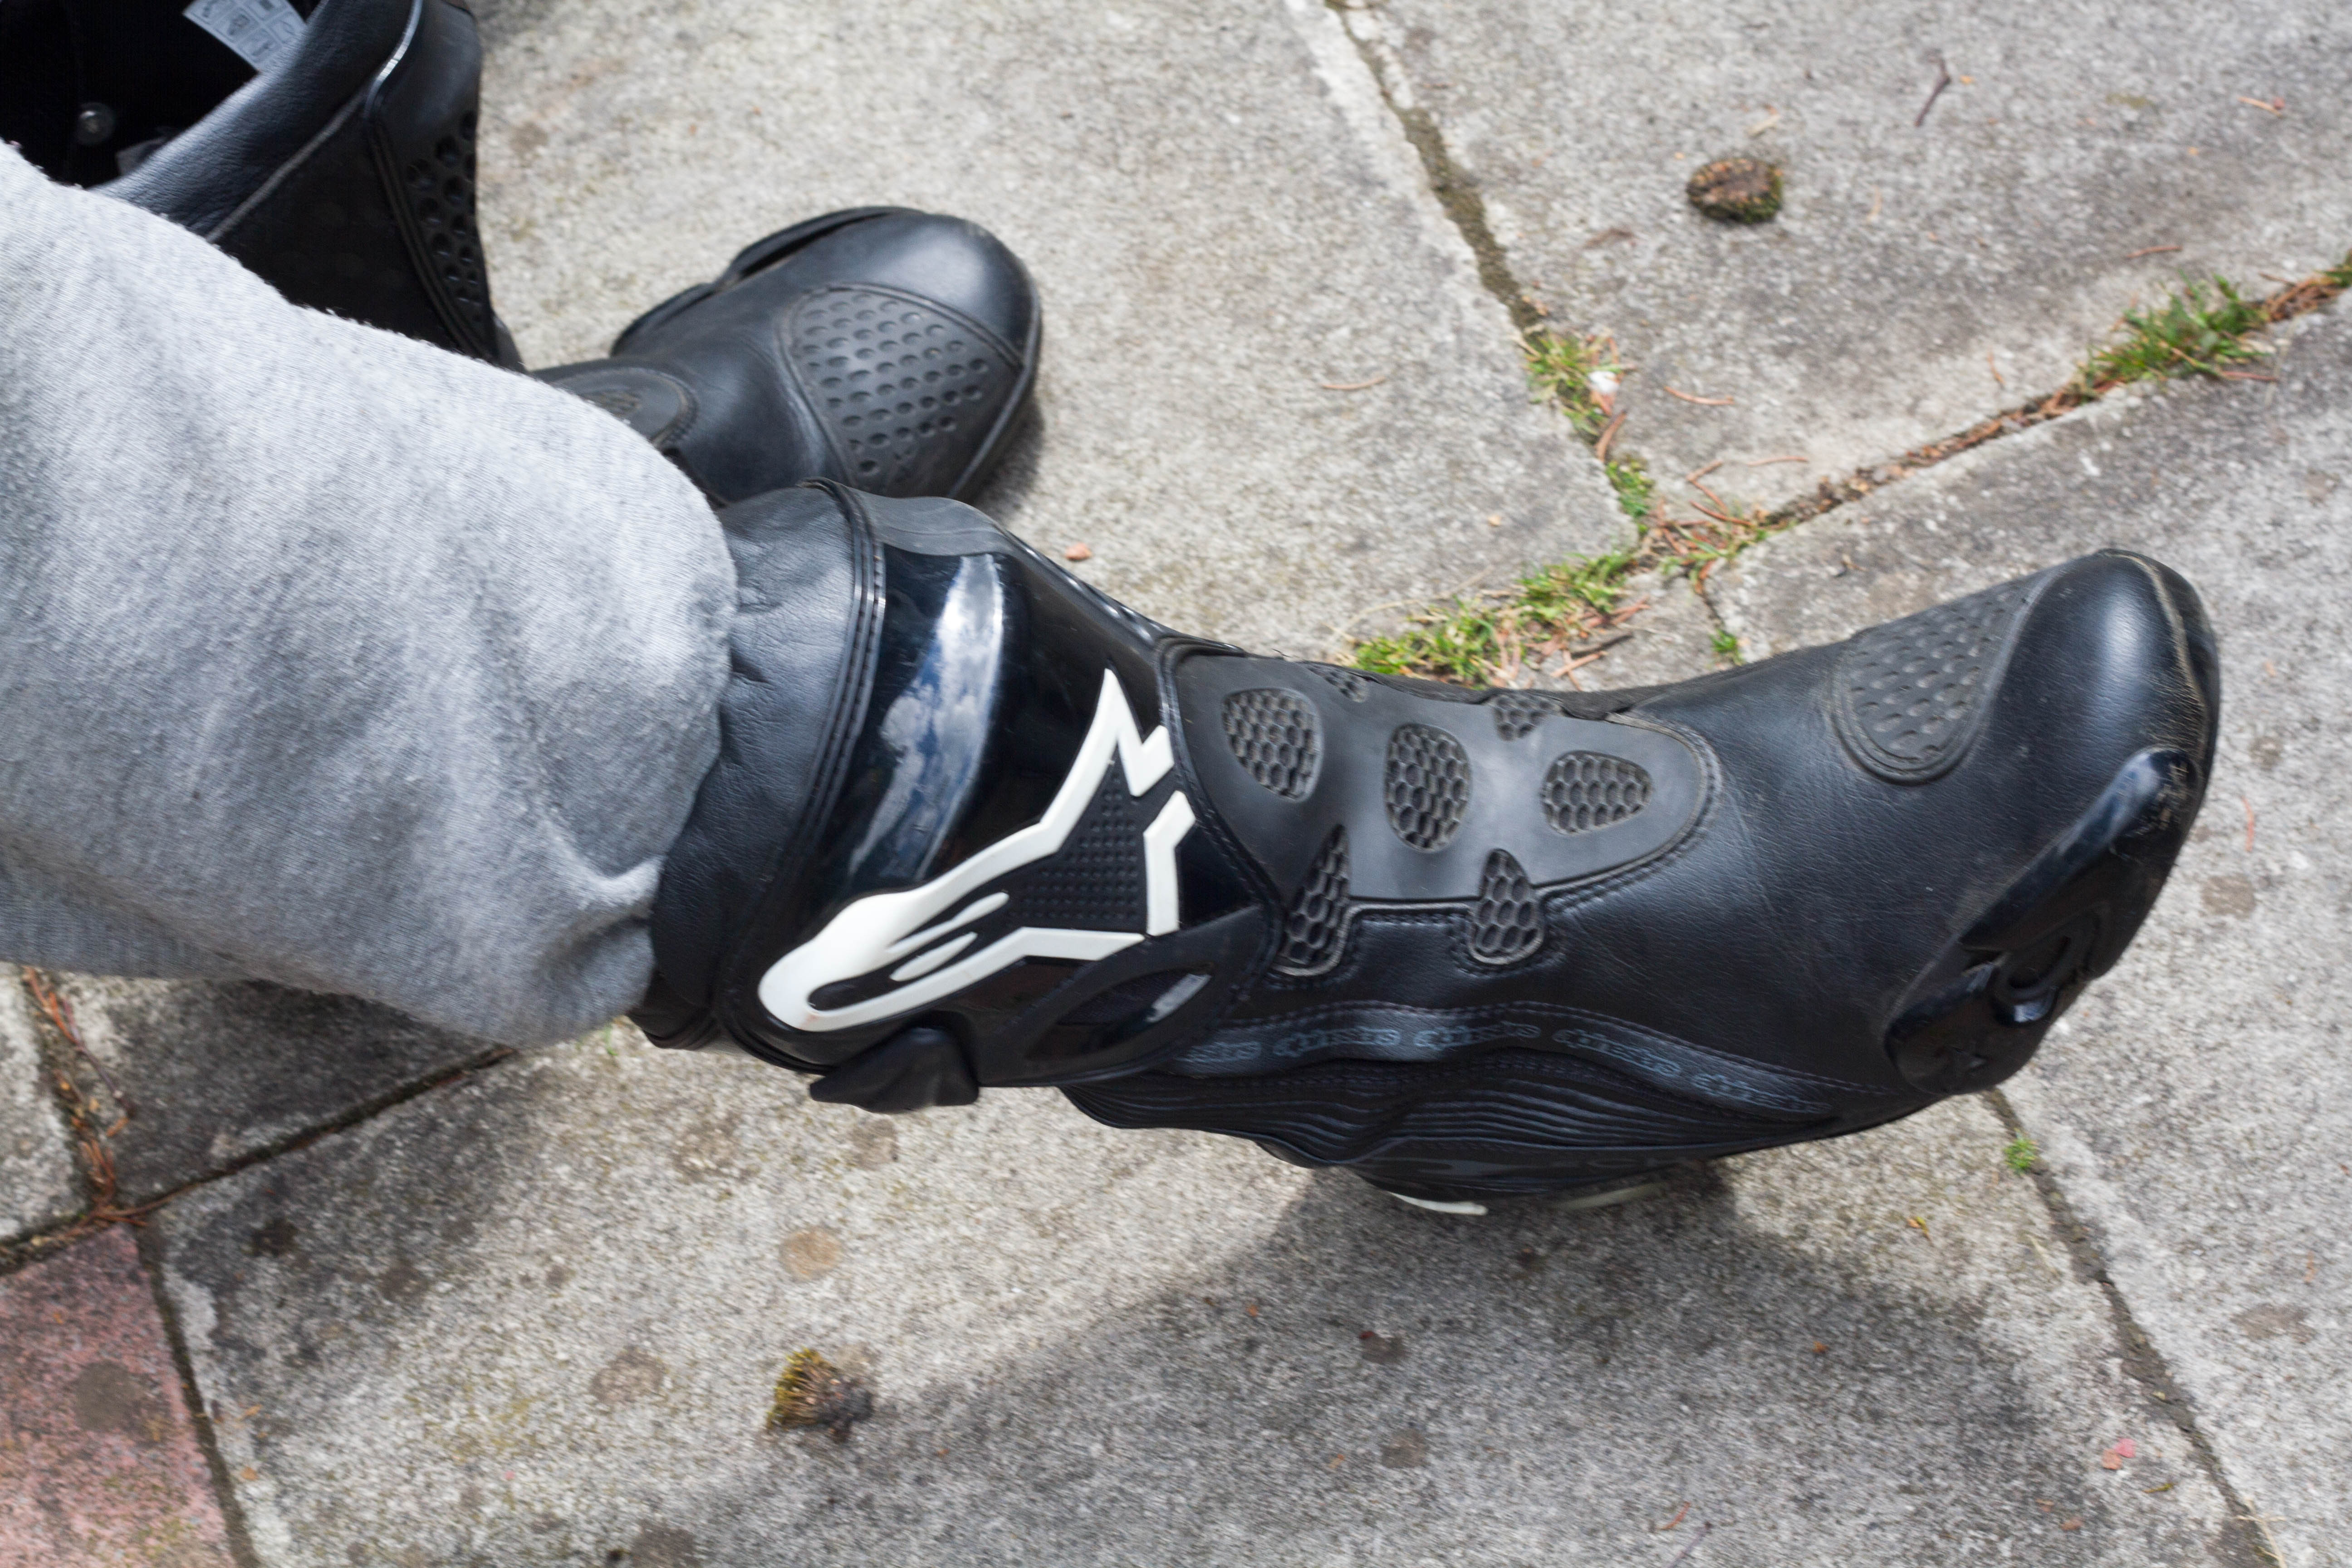 Supertech R boots